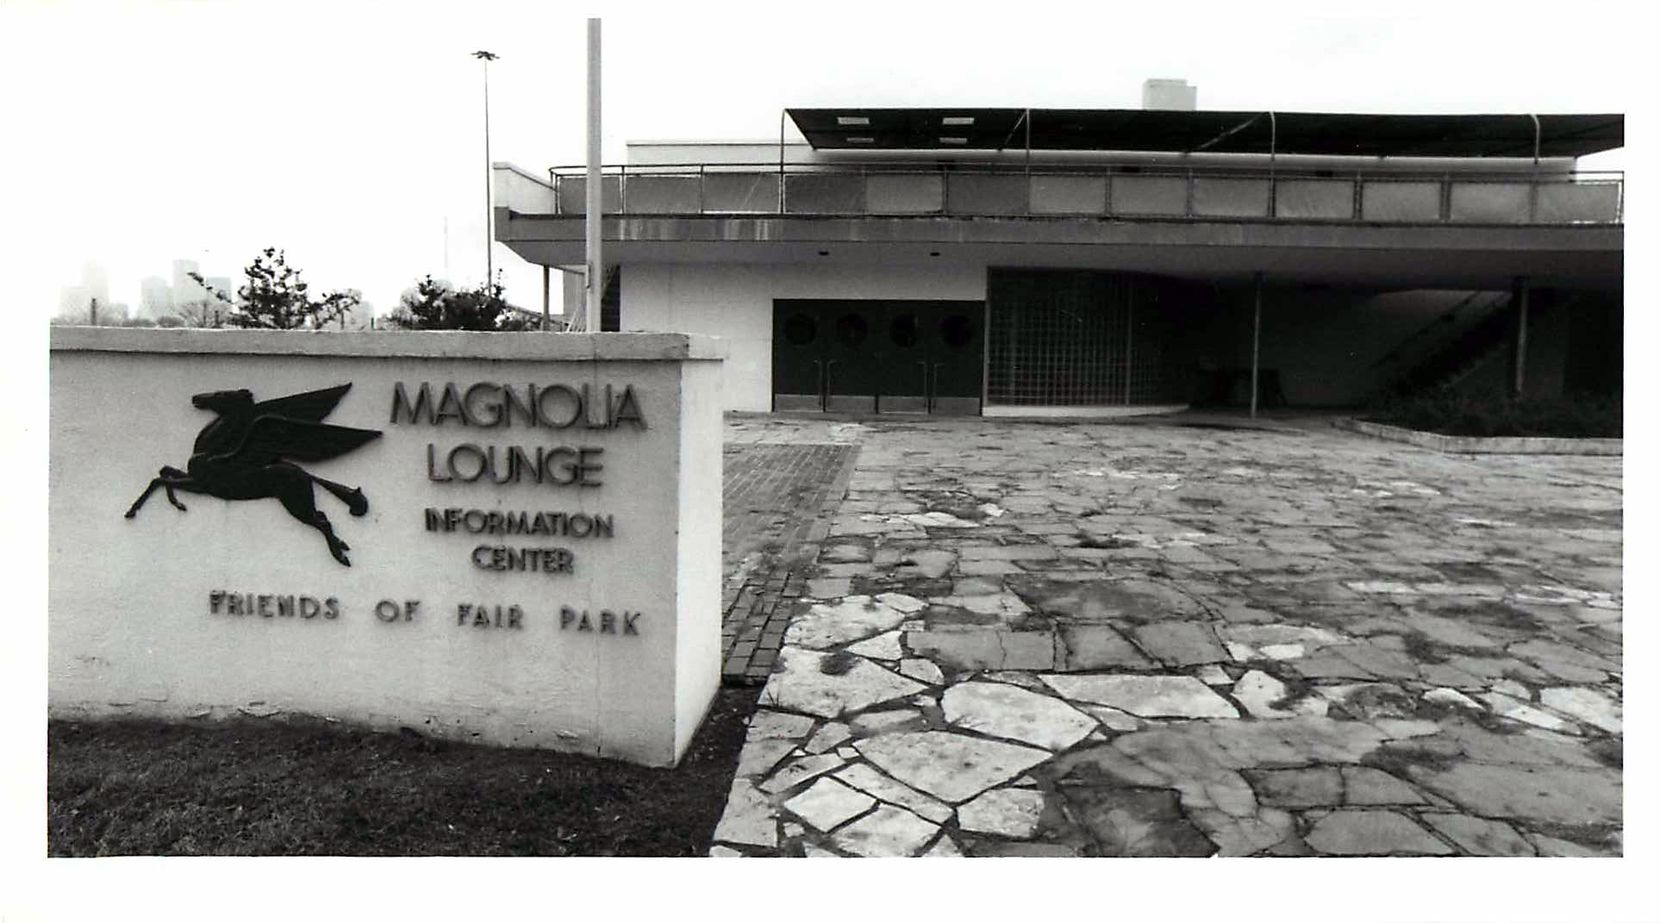 March 9, 1992: Magnolia Lounge at Fair Park